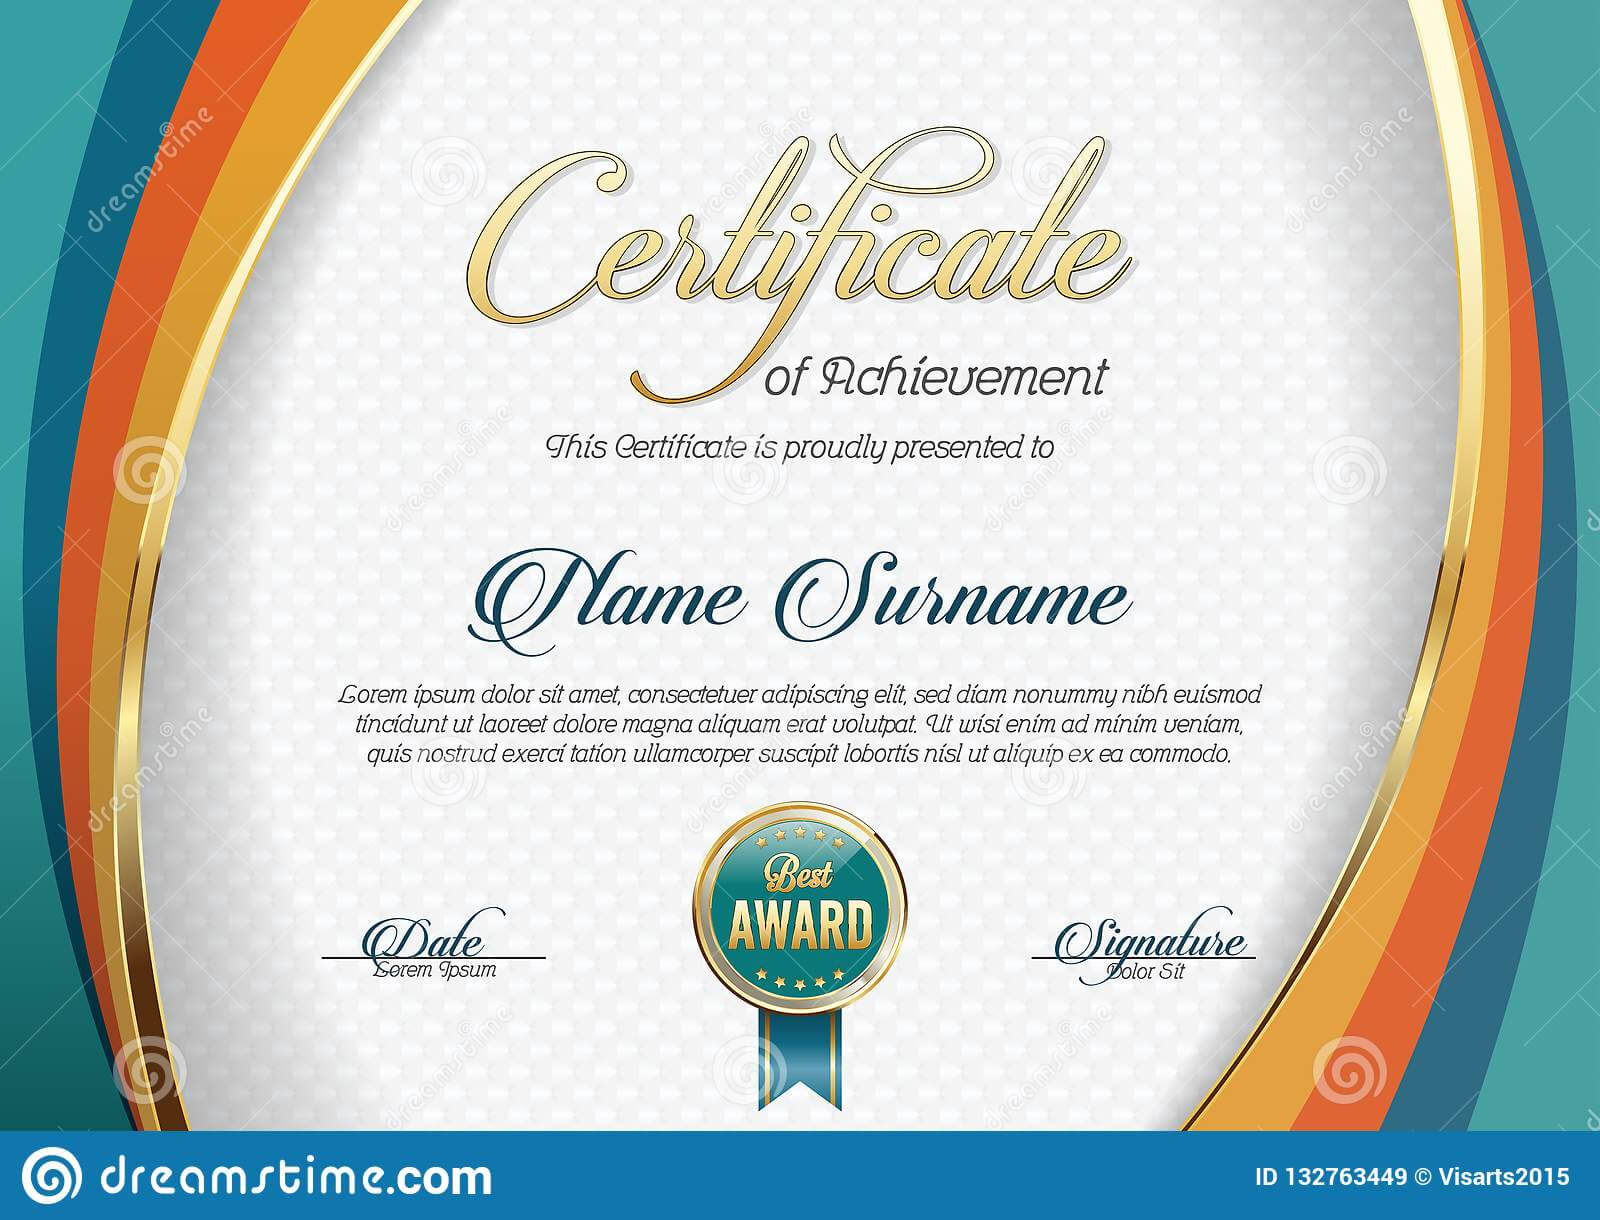 Certificate Of Achievement. Landscape. Template. Stock with regard to Landscape Certificate Templates